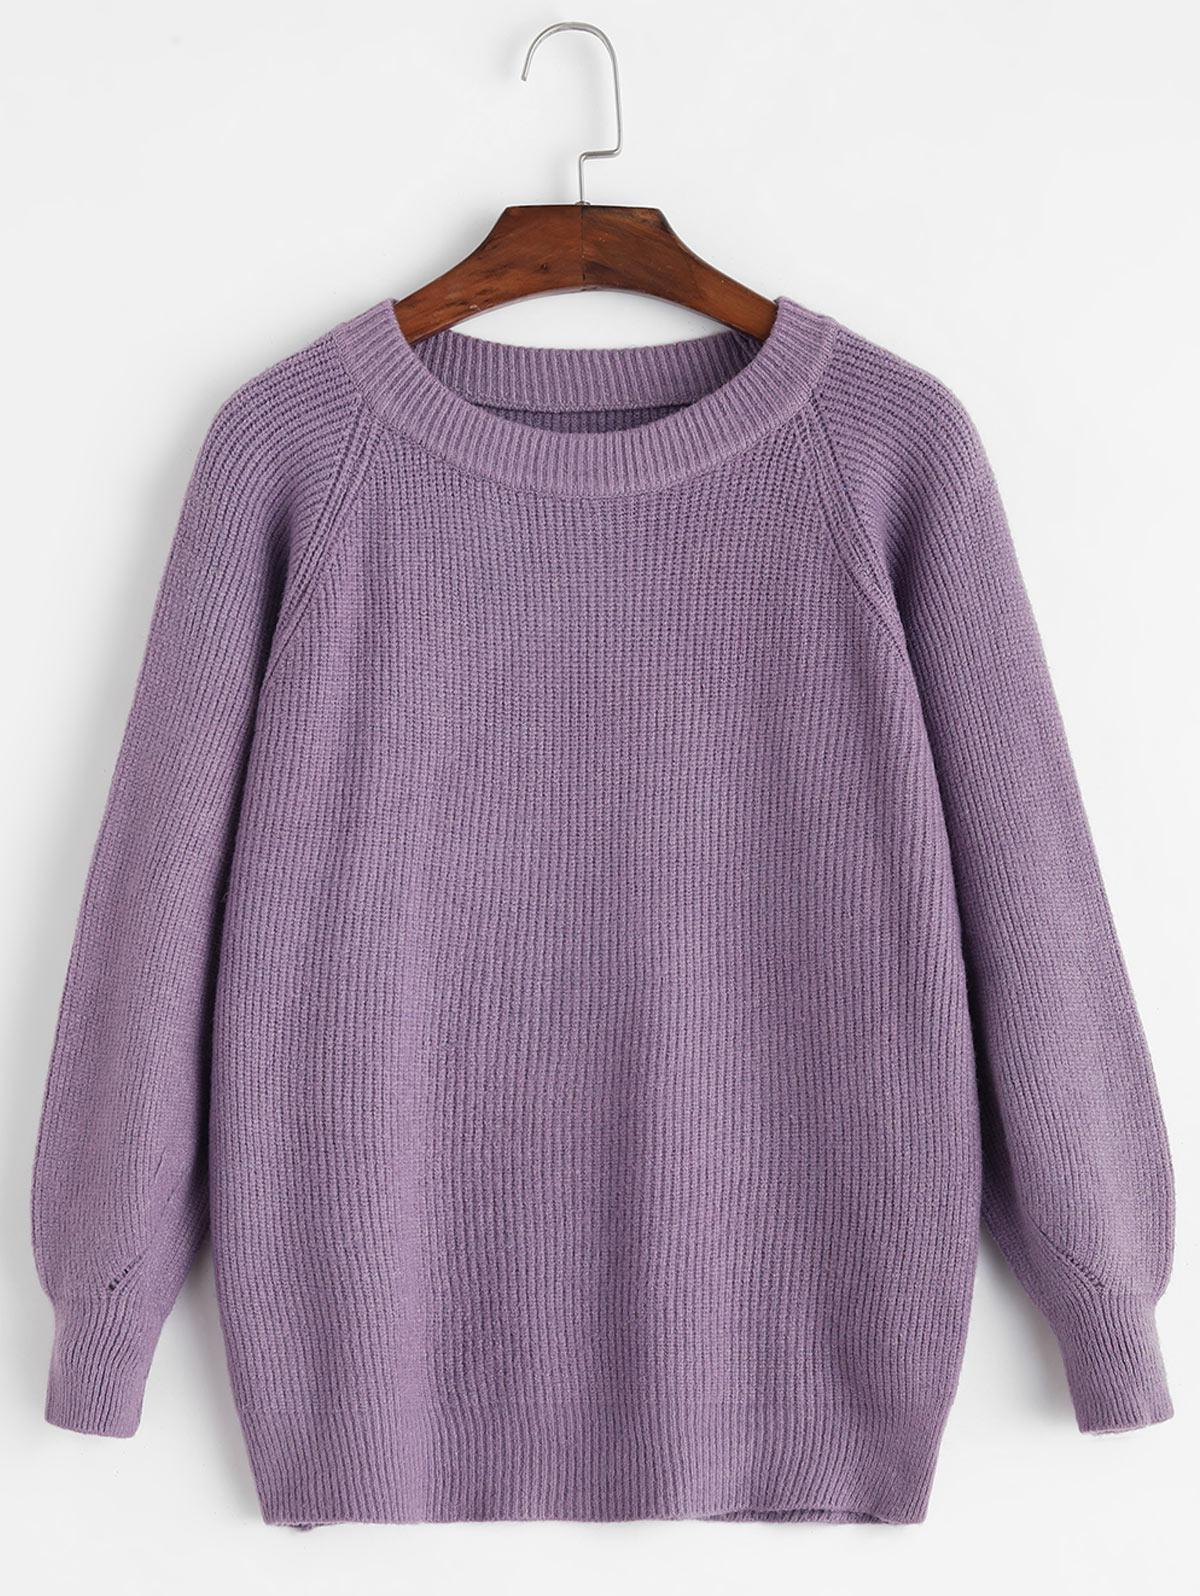 Raglan Sleeve Crew Neck Pointelle Knit Sweater